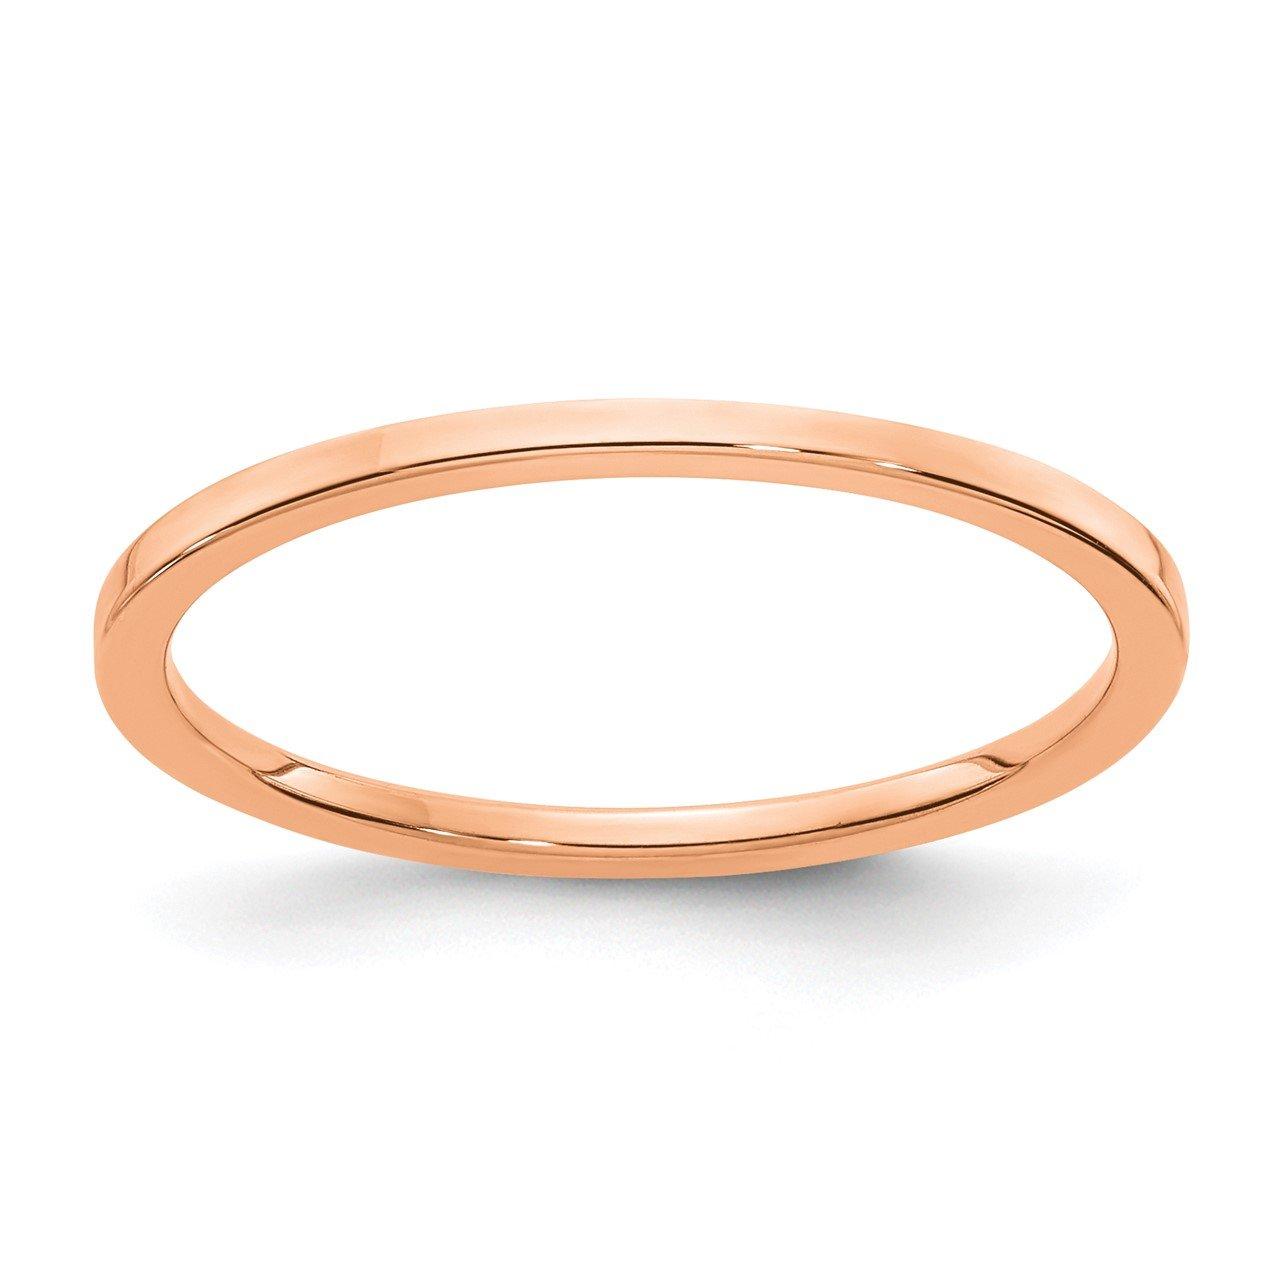 14K Rose Gold 1.2mm Flat Stackable Band